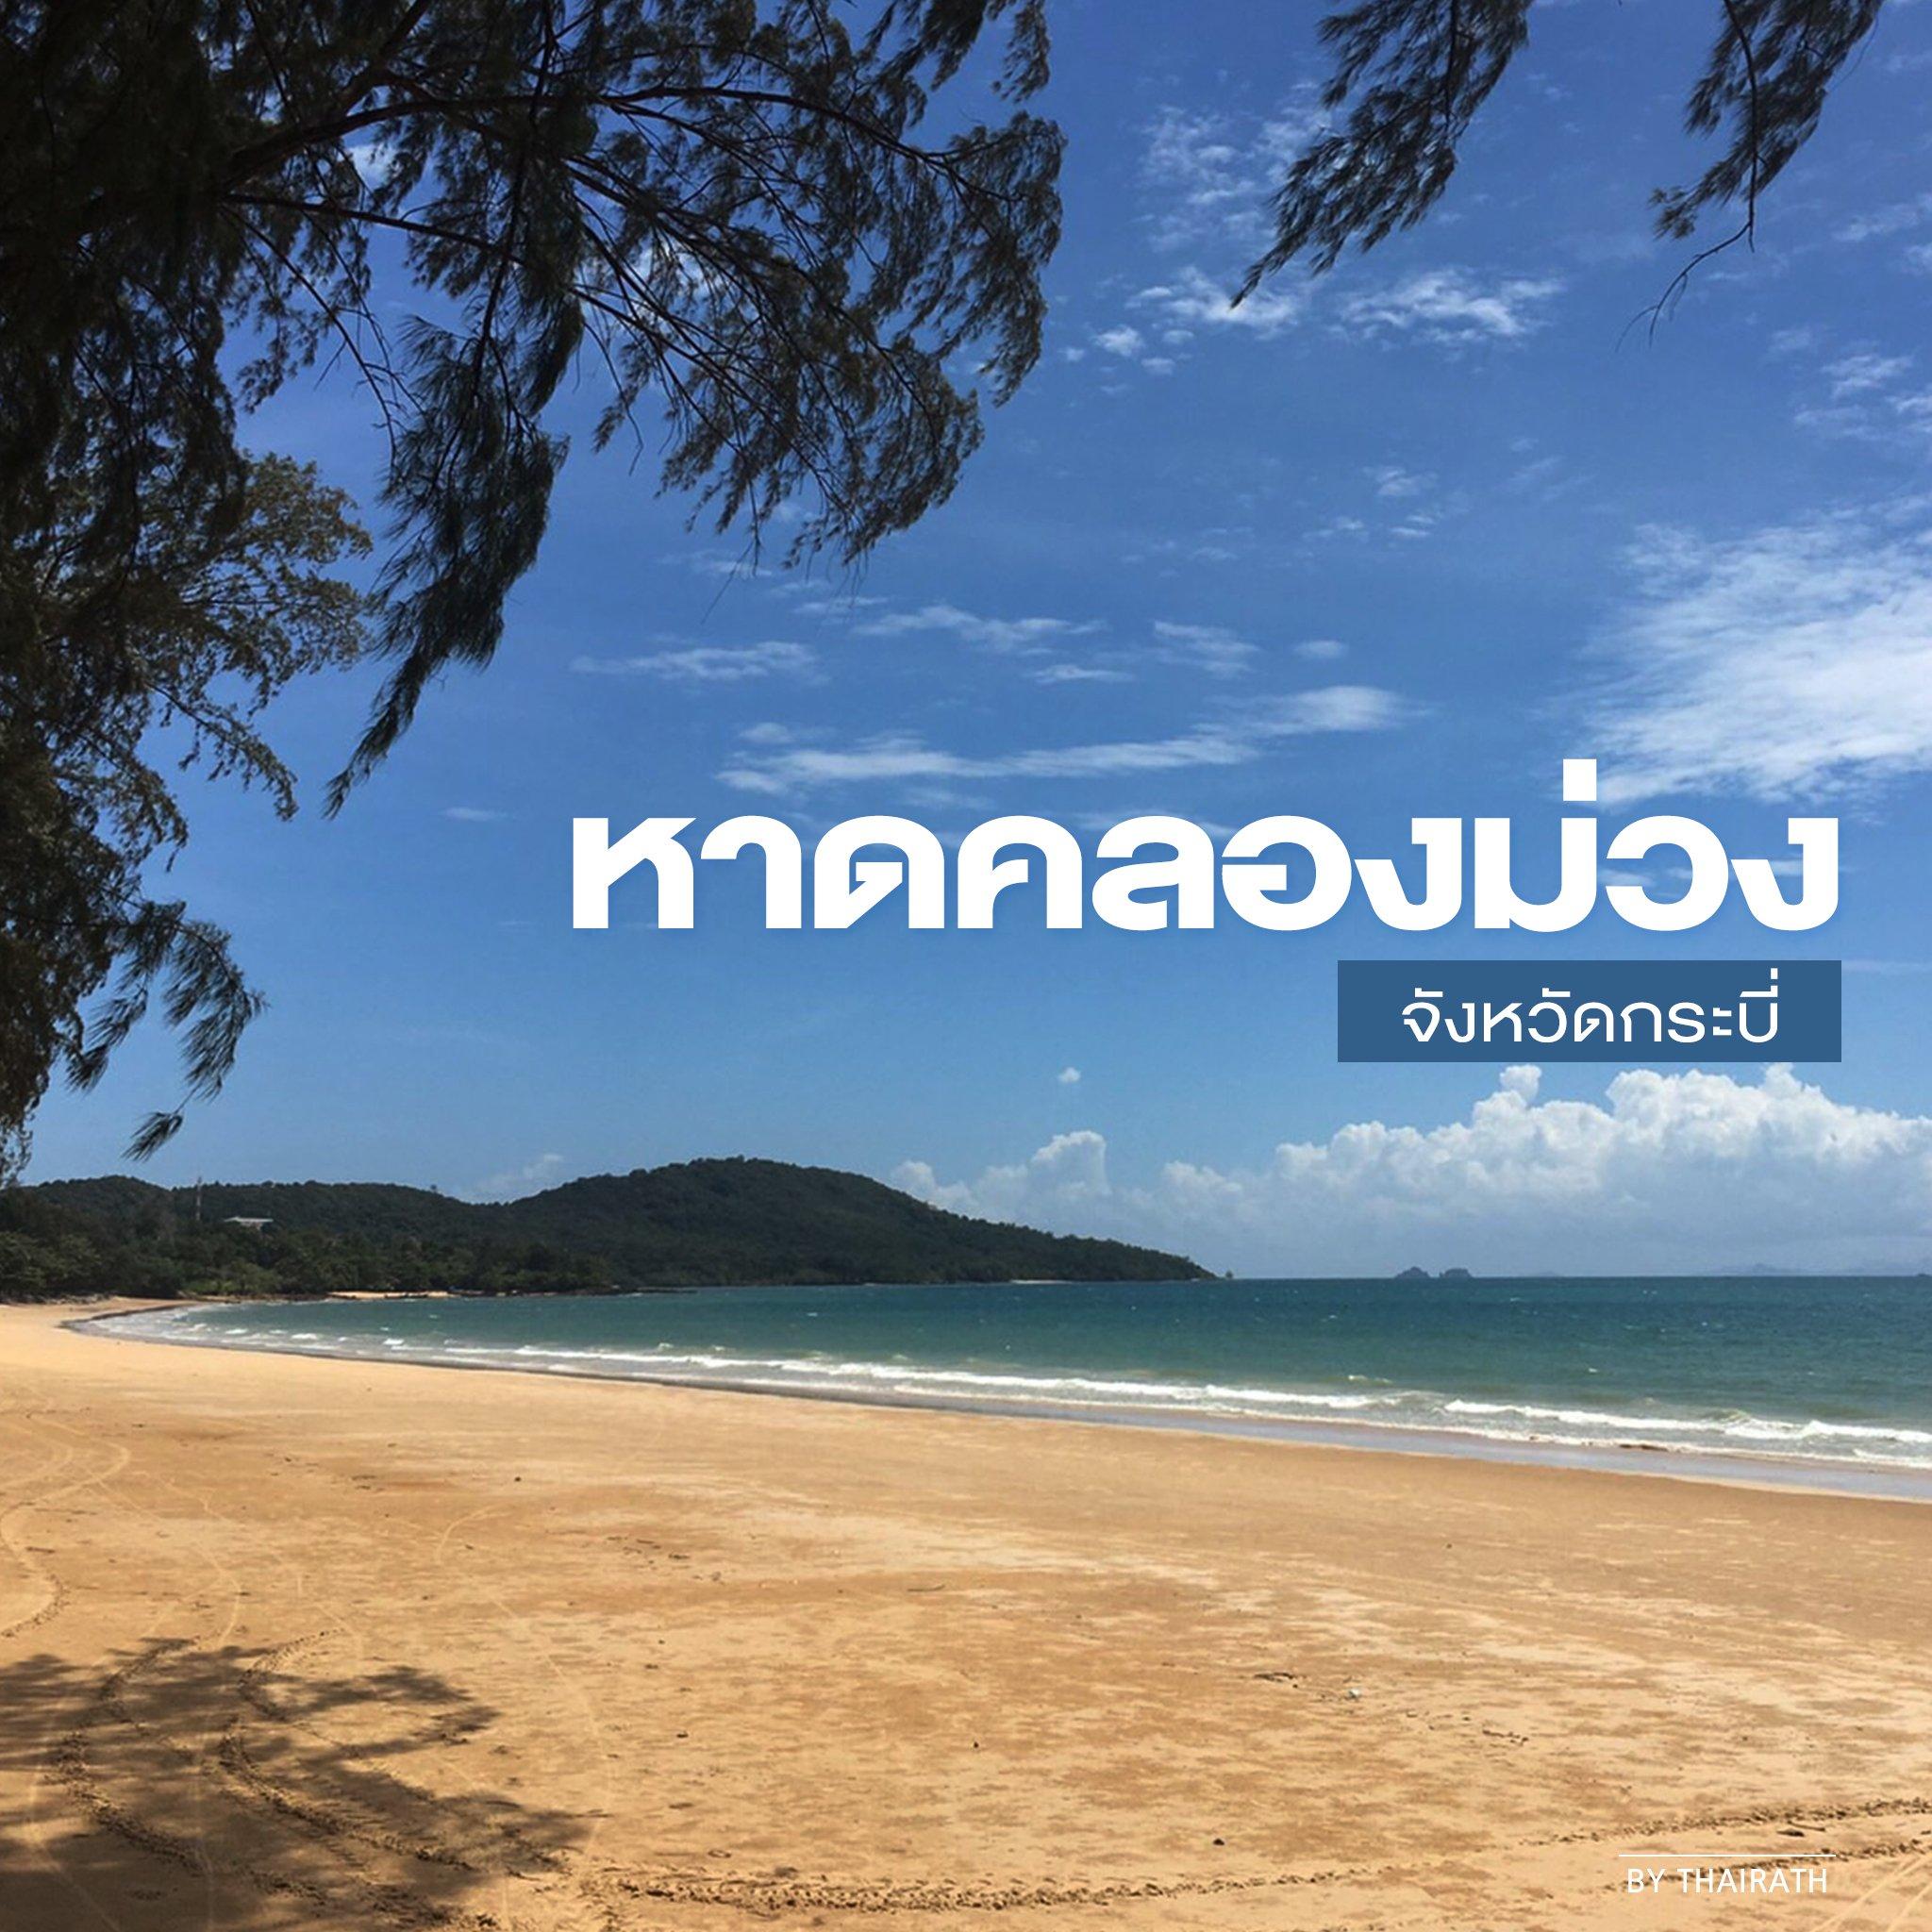 "Thairath_News on Twitter: """"หาดคลองม่วง"" จ.กระบี่ ชายหาด ..."